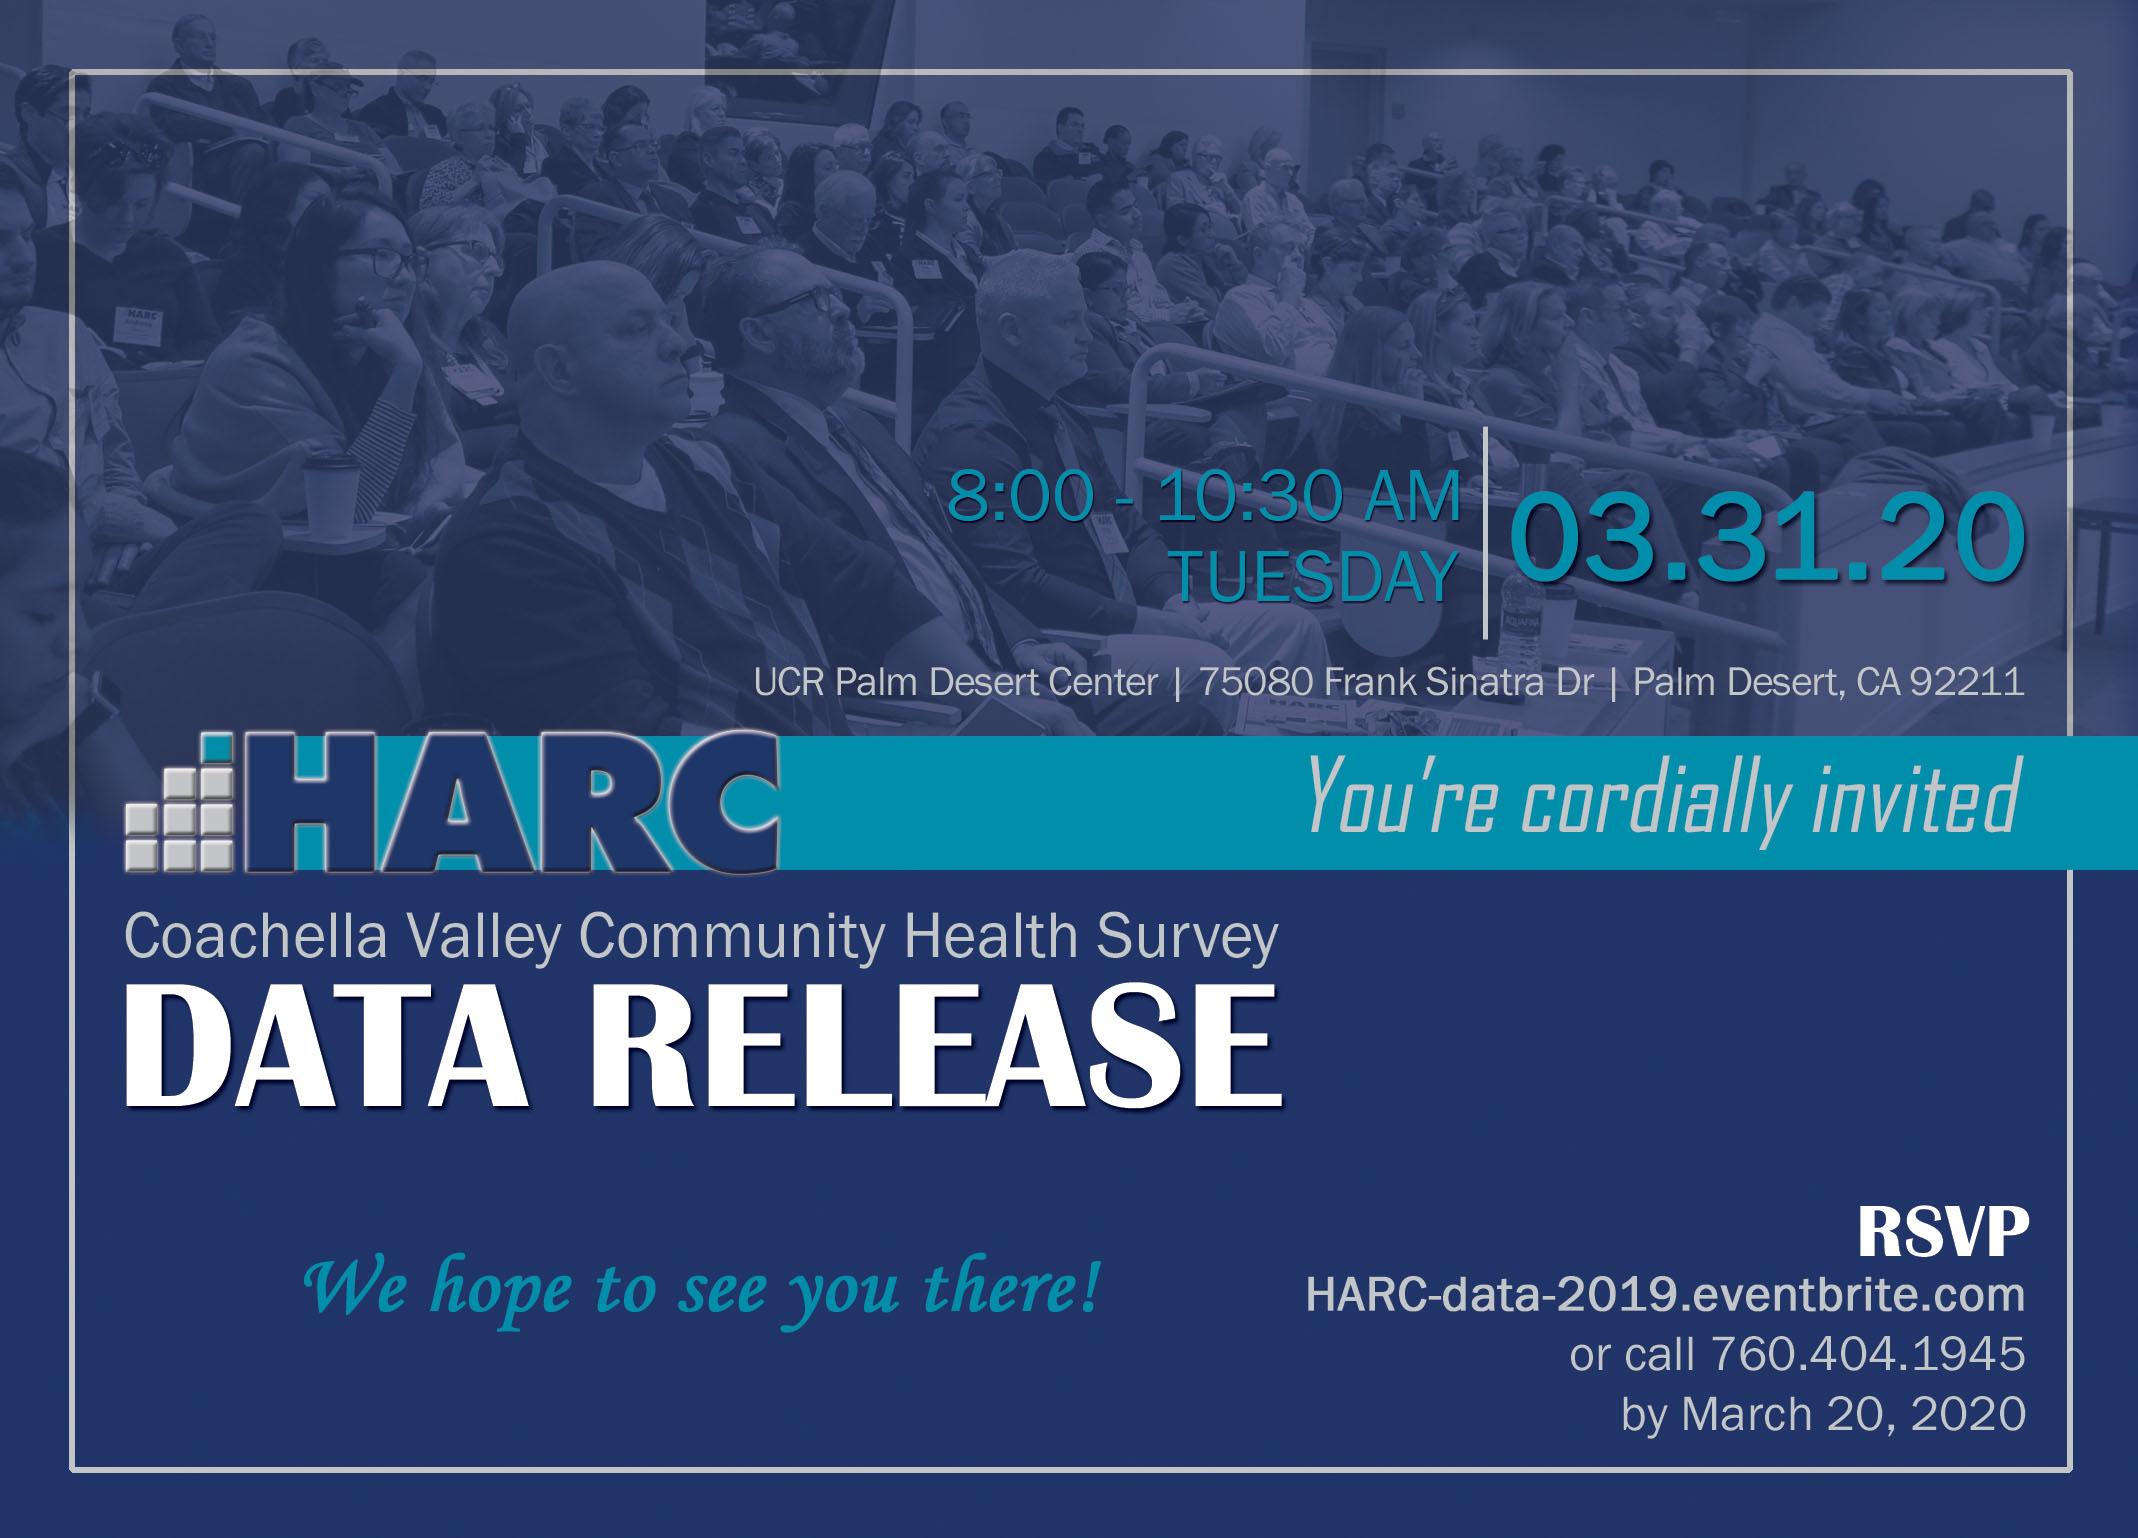 HARC 2019 Coachella Valley Community Health Survey Data Release